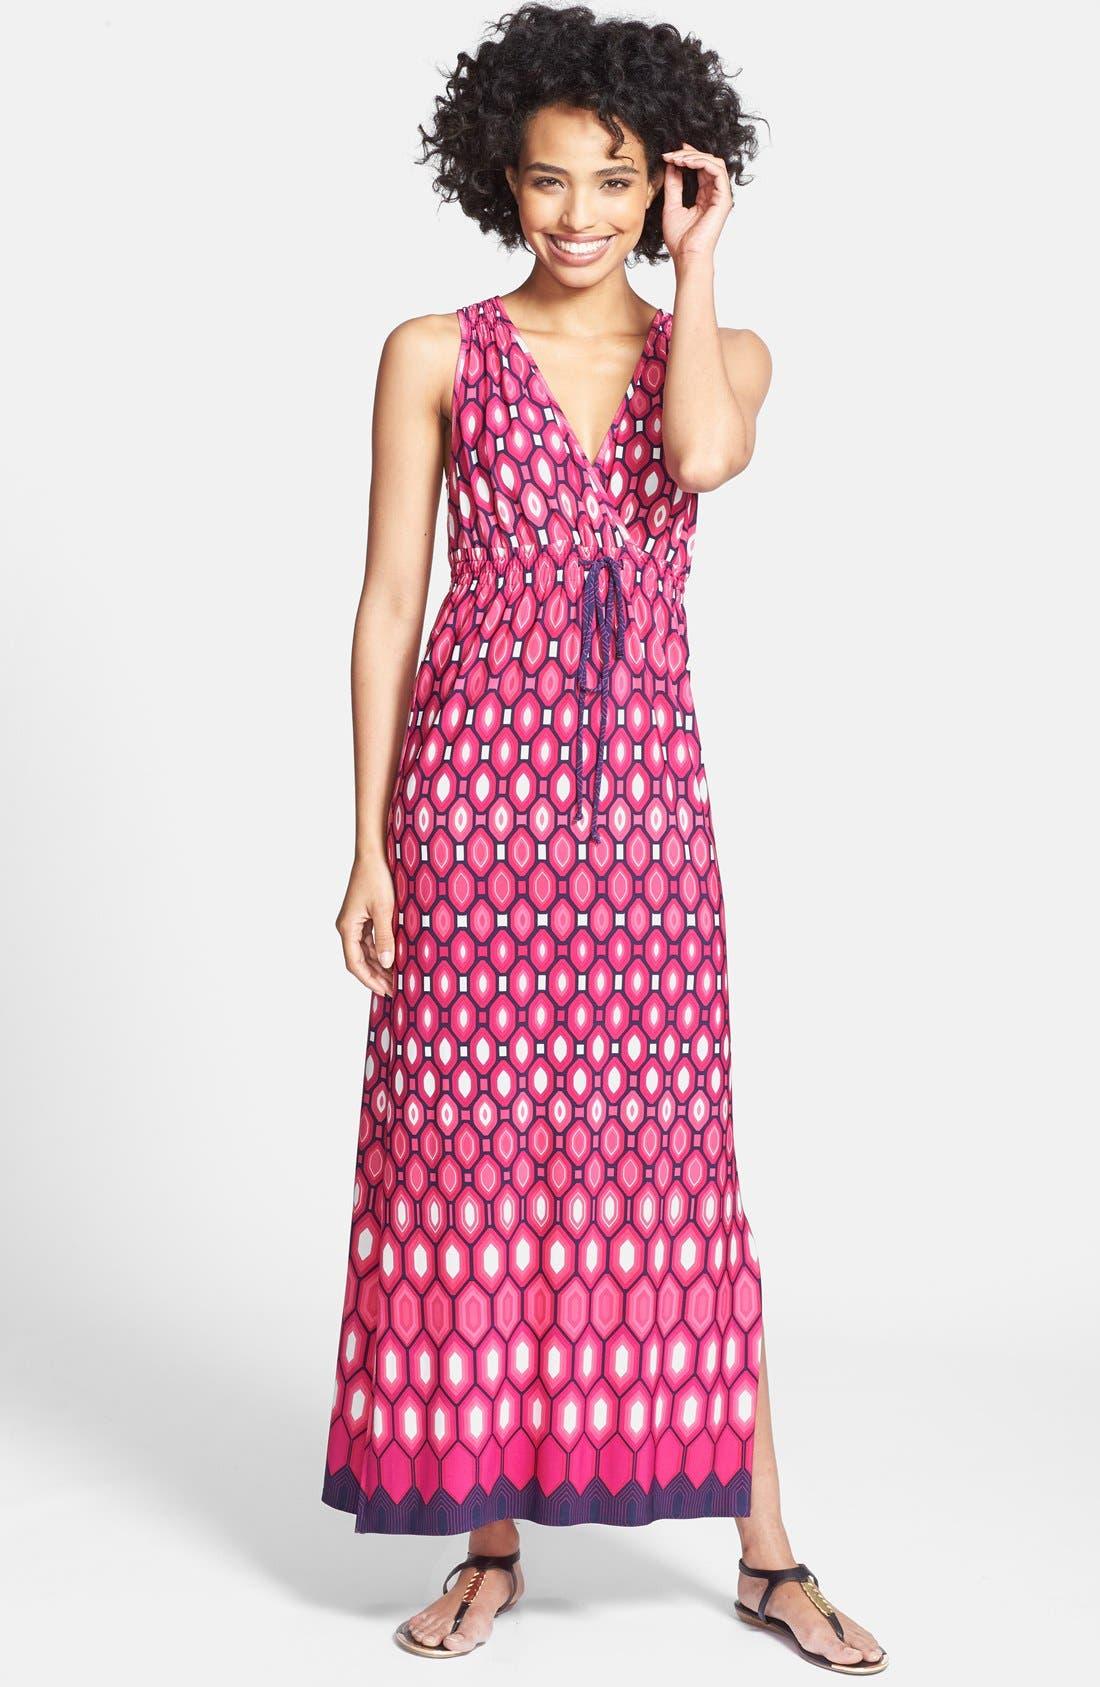 Alternate Image 1 Selected - Laundry by Shelli Segal Print Surplice V-Neck Maxi Dress